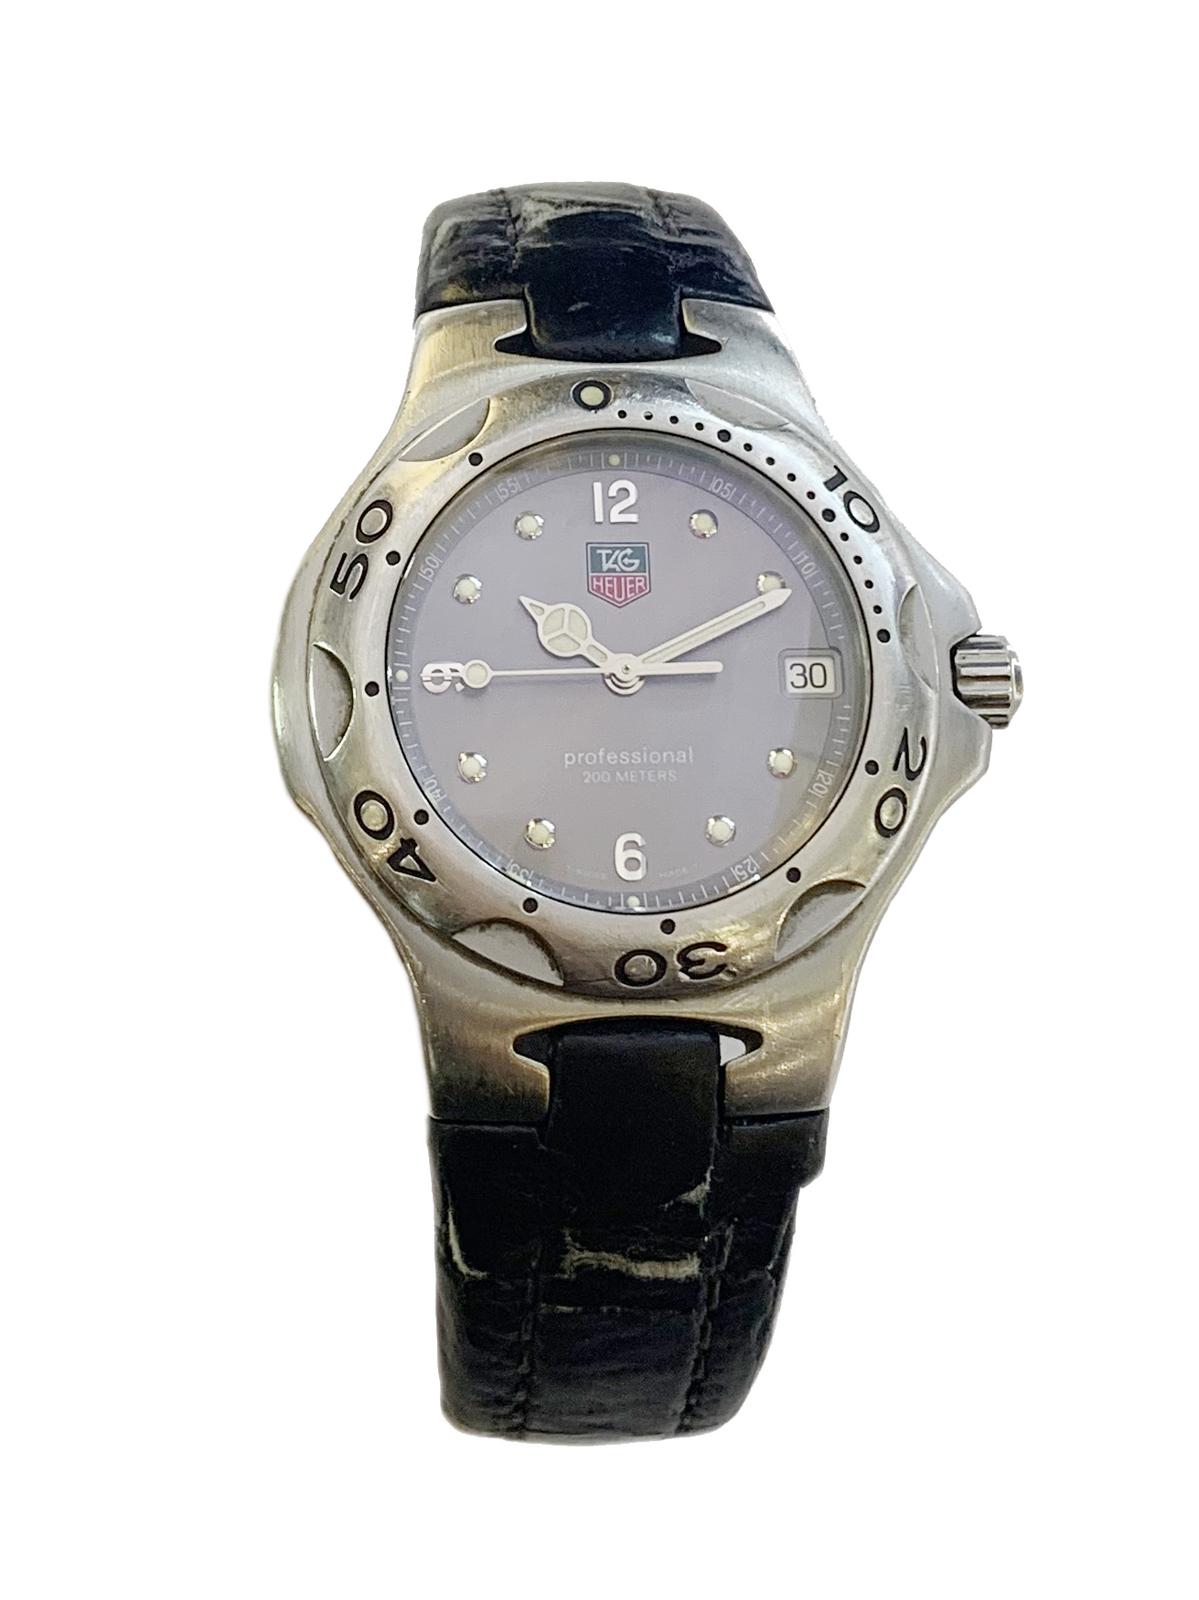 TAG Heuer Kirium Professional Stainless Steel Watch WL1111 - $380.00